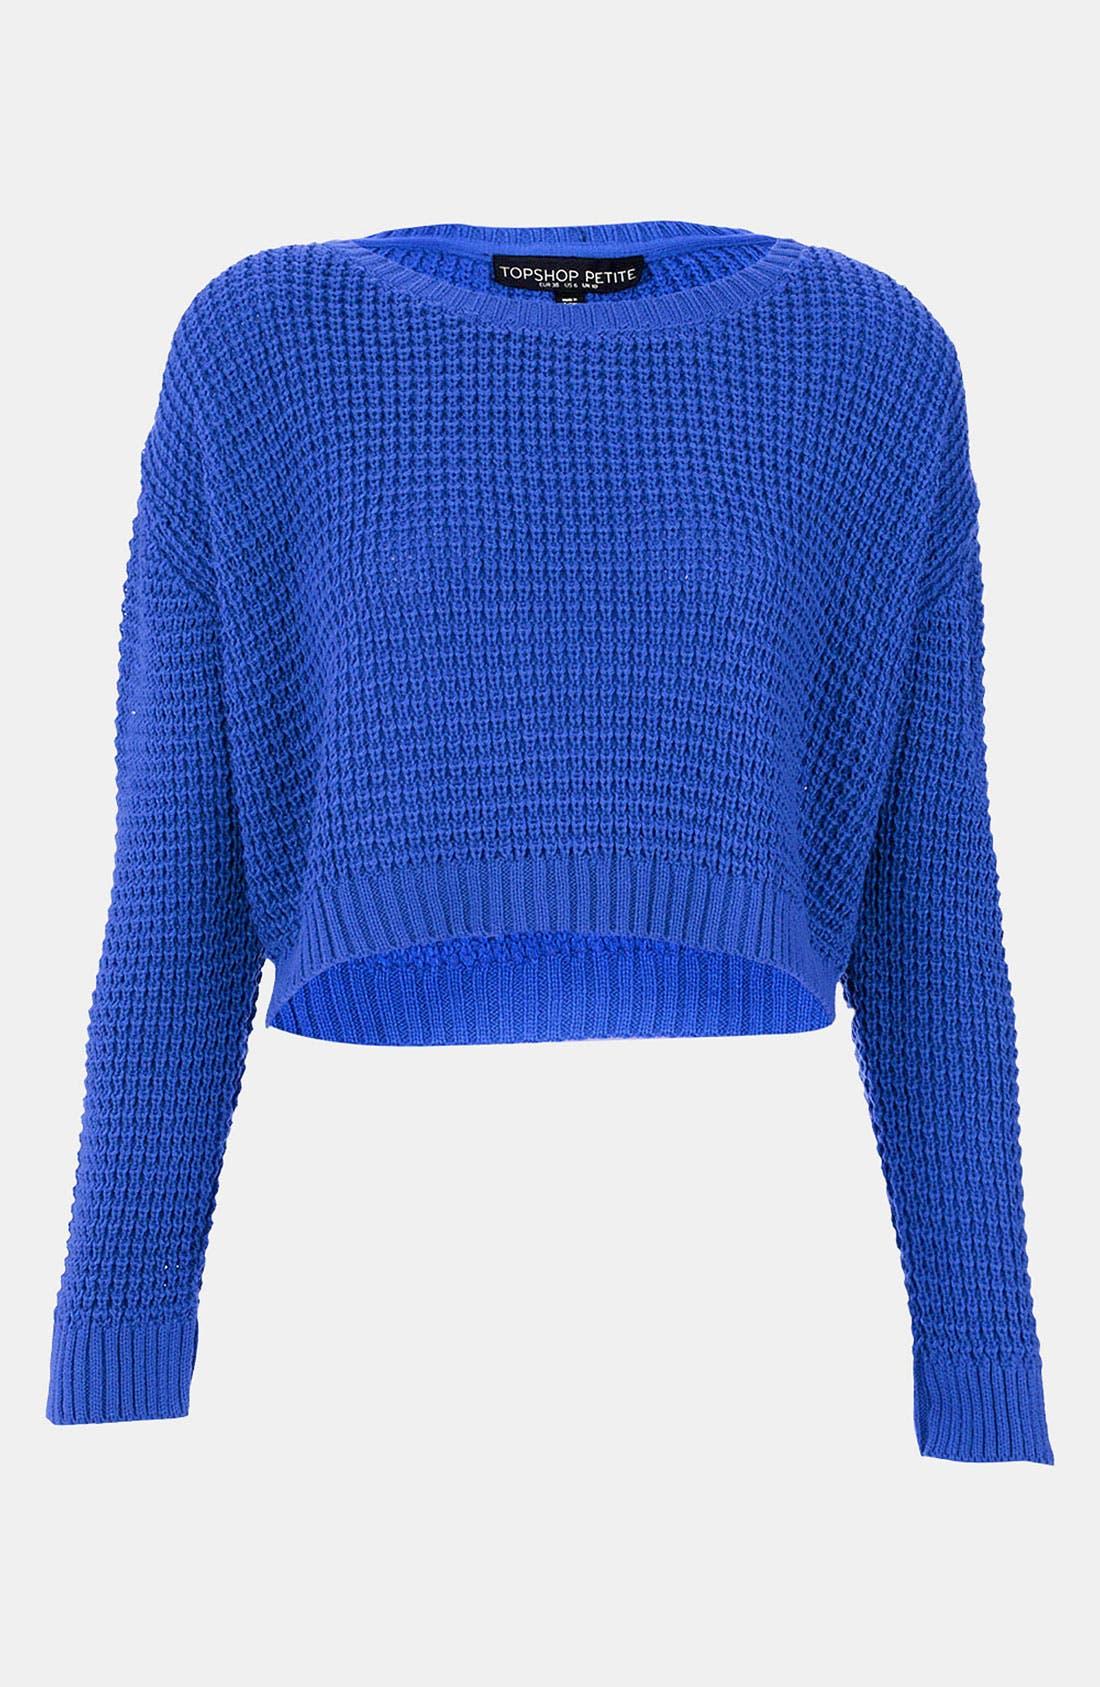 Alternate Image 1 Selected - Topshop Crop Sweater (Petite)